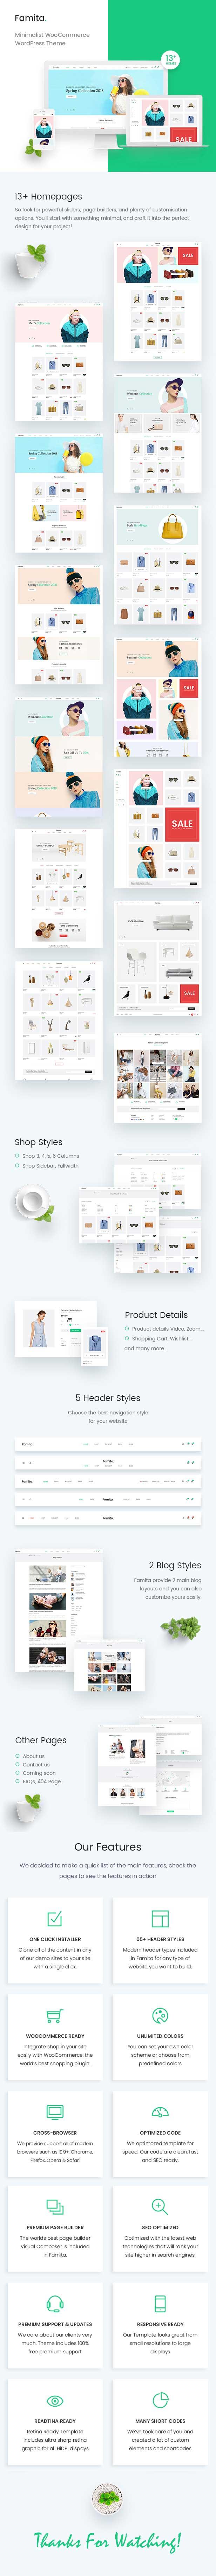 Famita - minimalistisches WooCommerce WordPress Layout